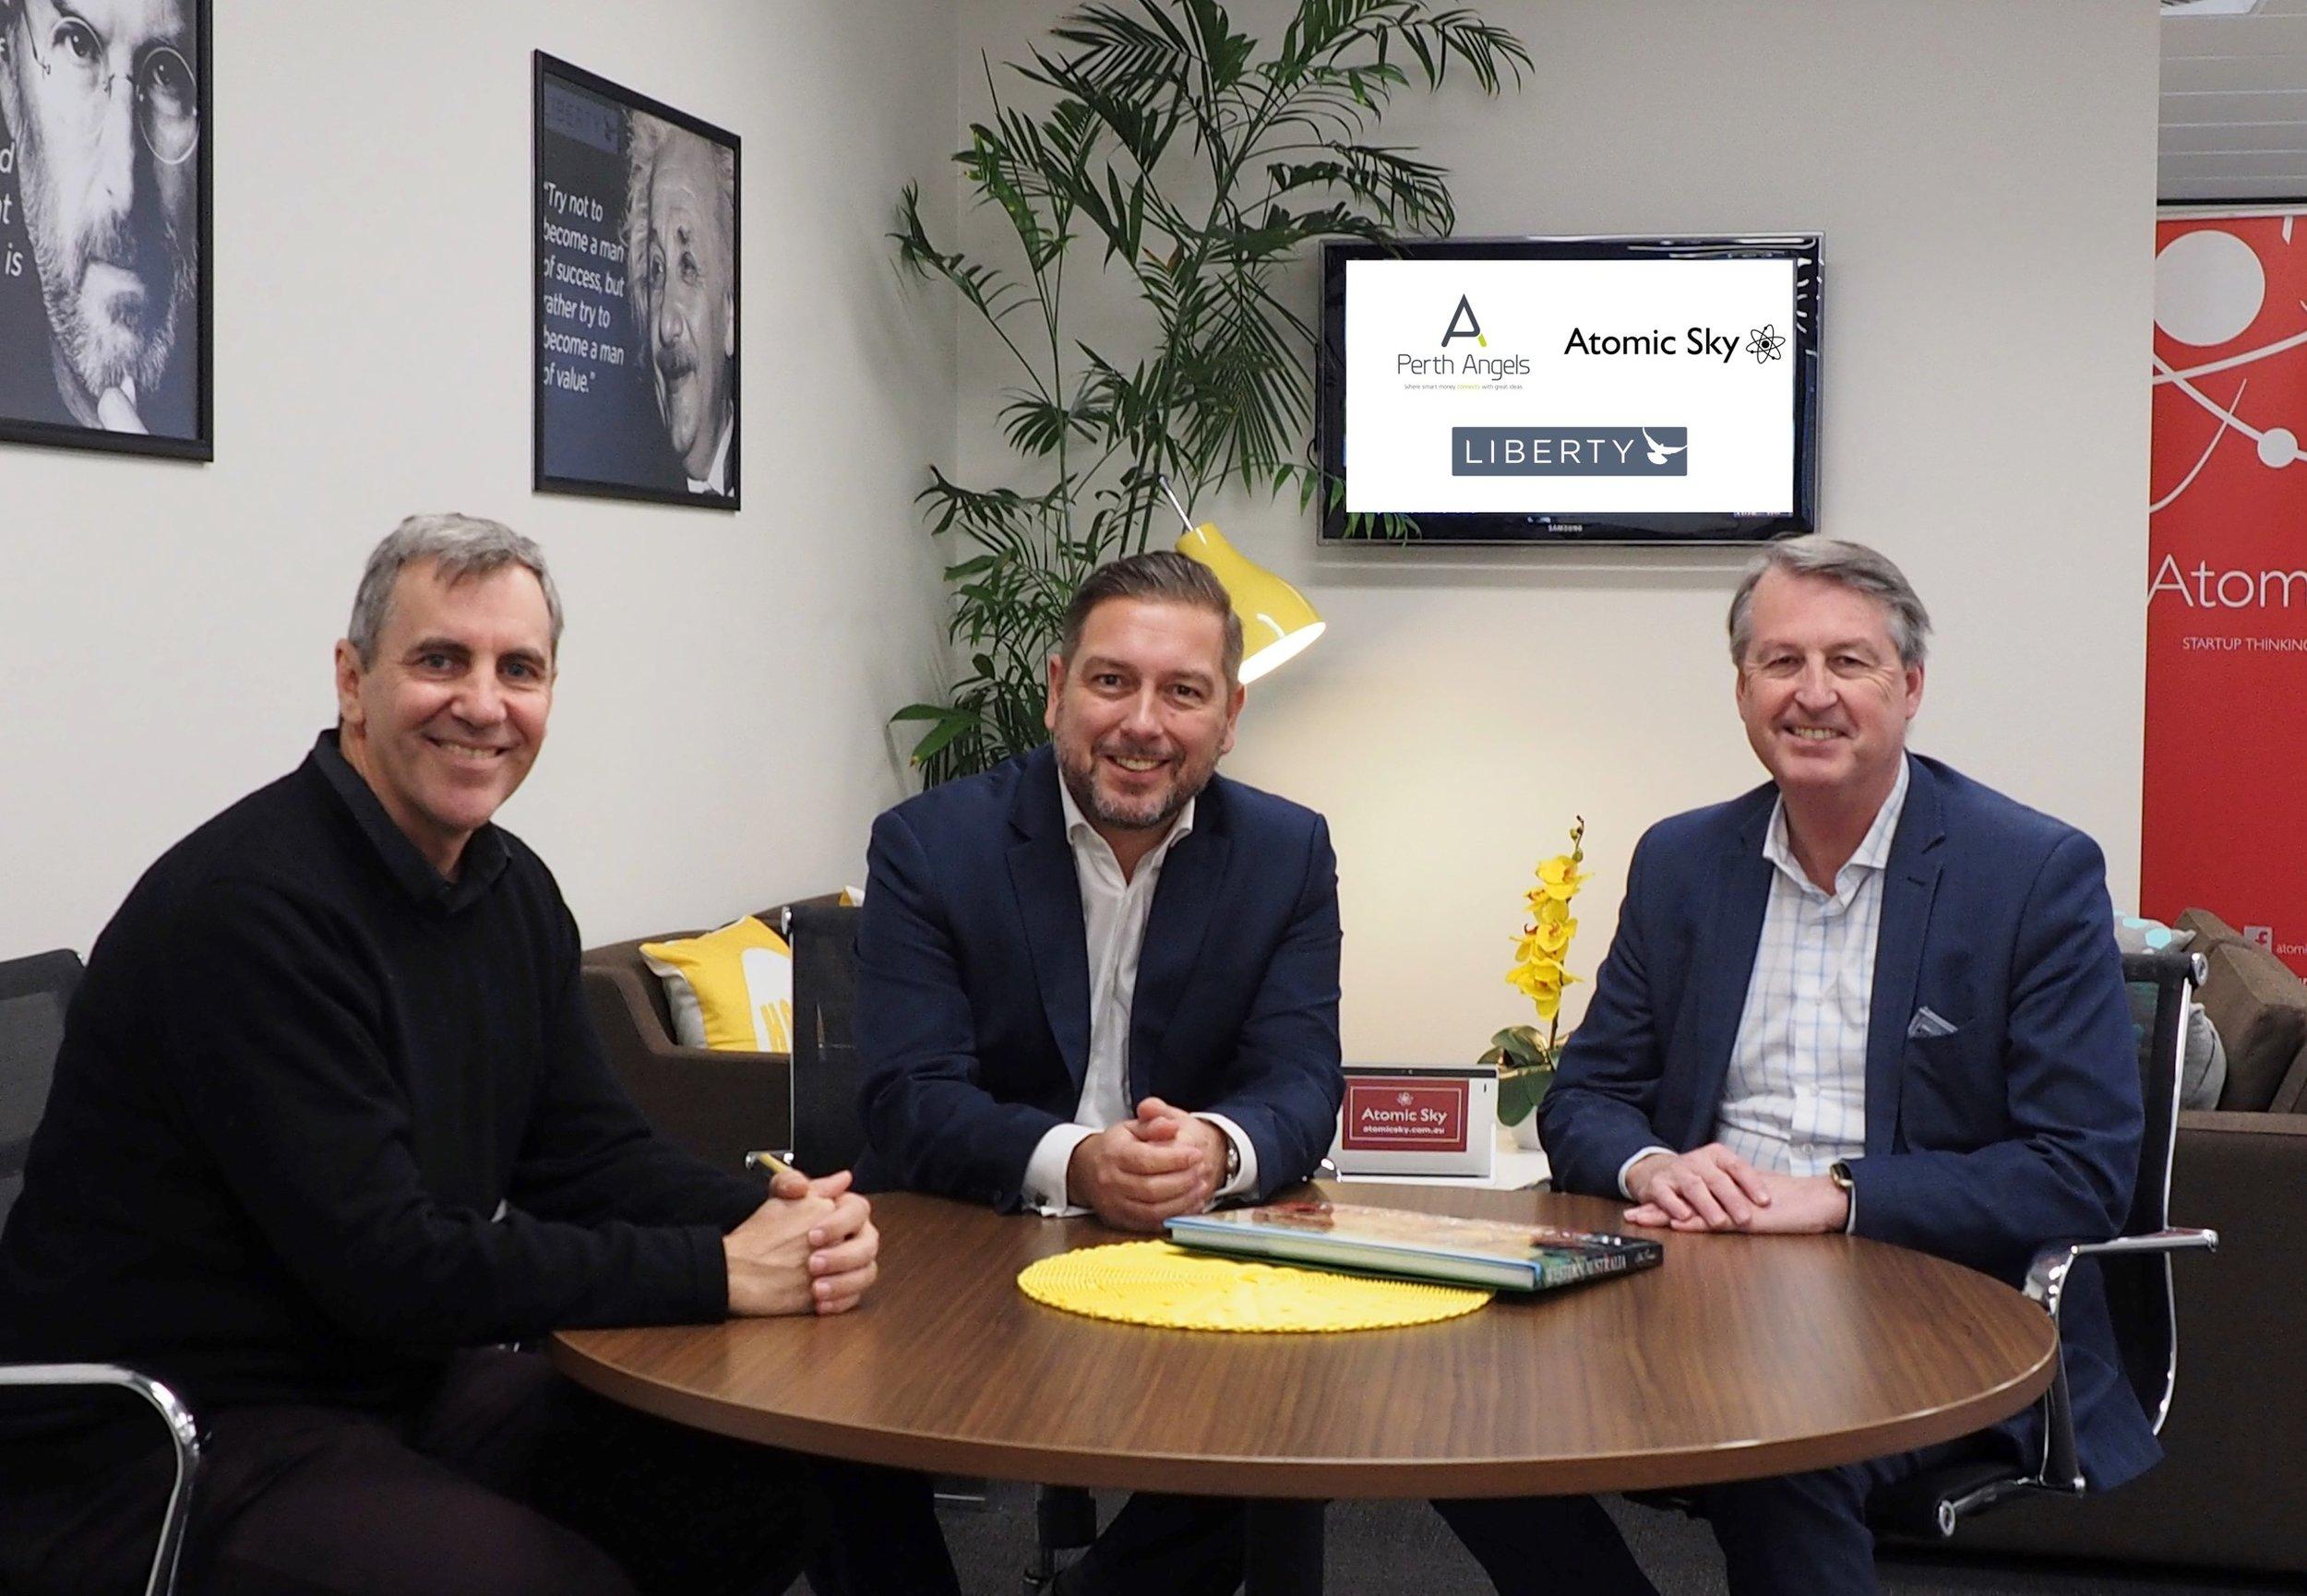 Perth Angels Atomic Sky Liberty announcement (Peter, Greg, Jamie) (2).jpg